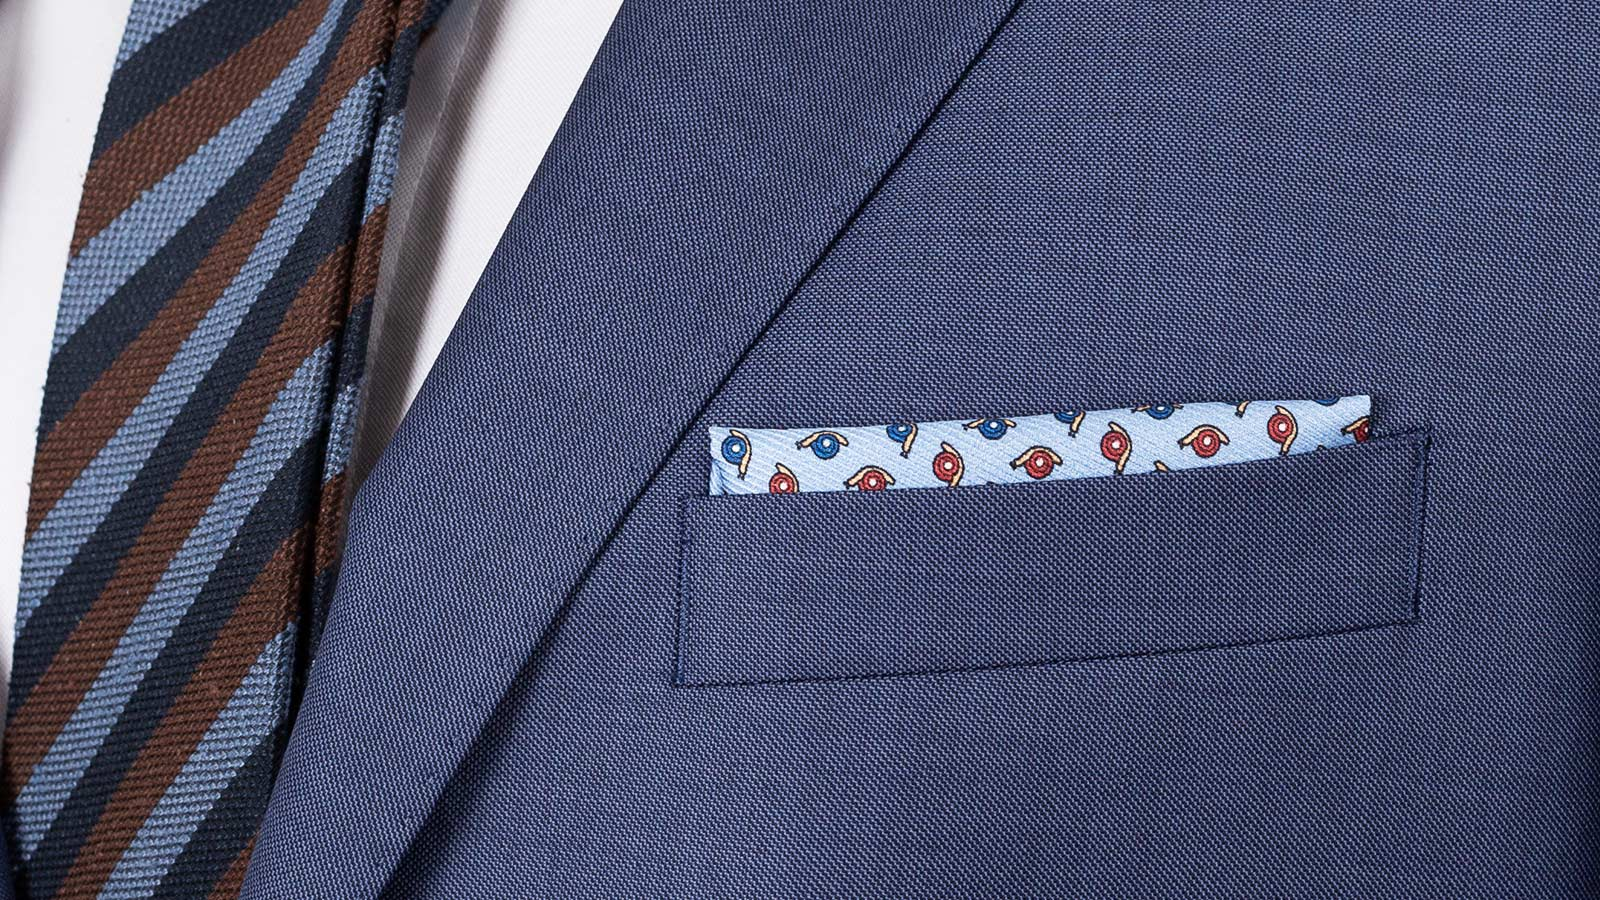 Suit in Sky Blue Pick & Pick Wool - slider image 1